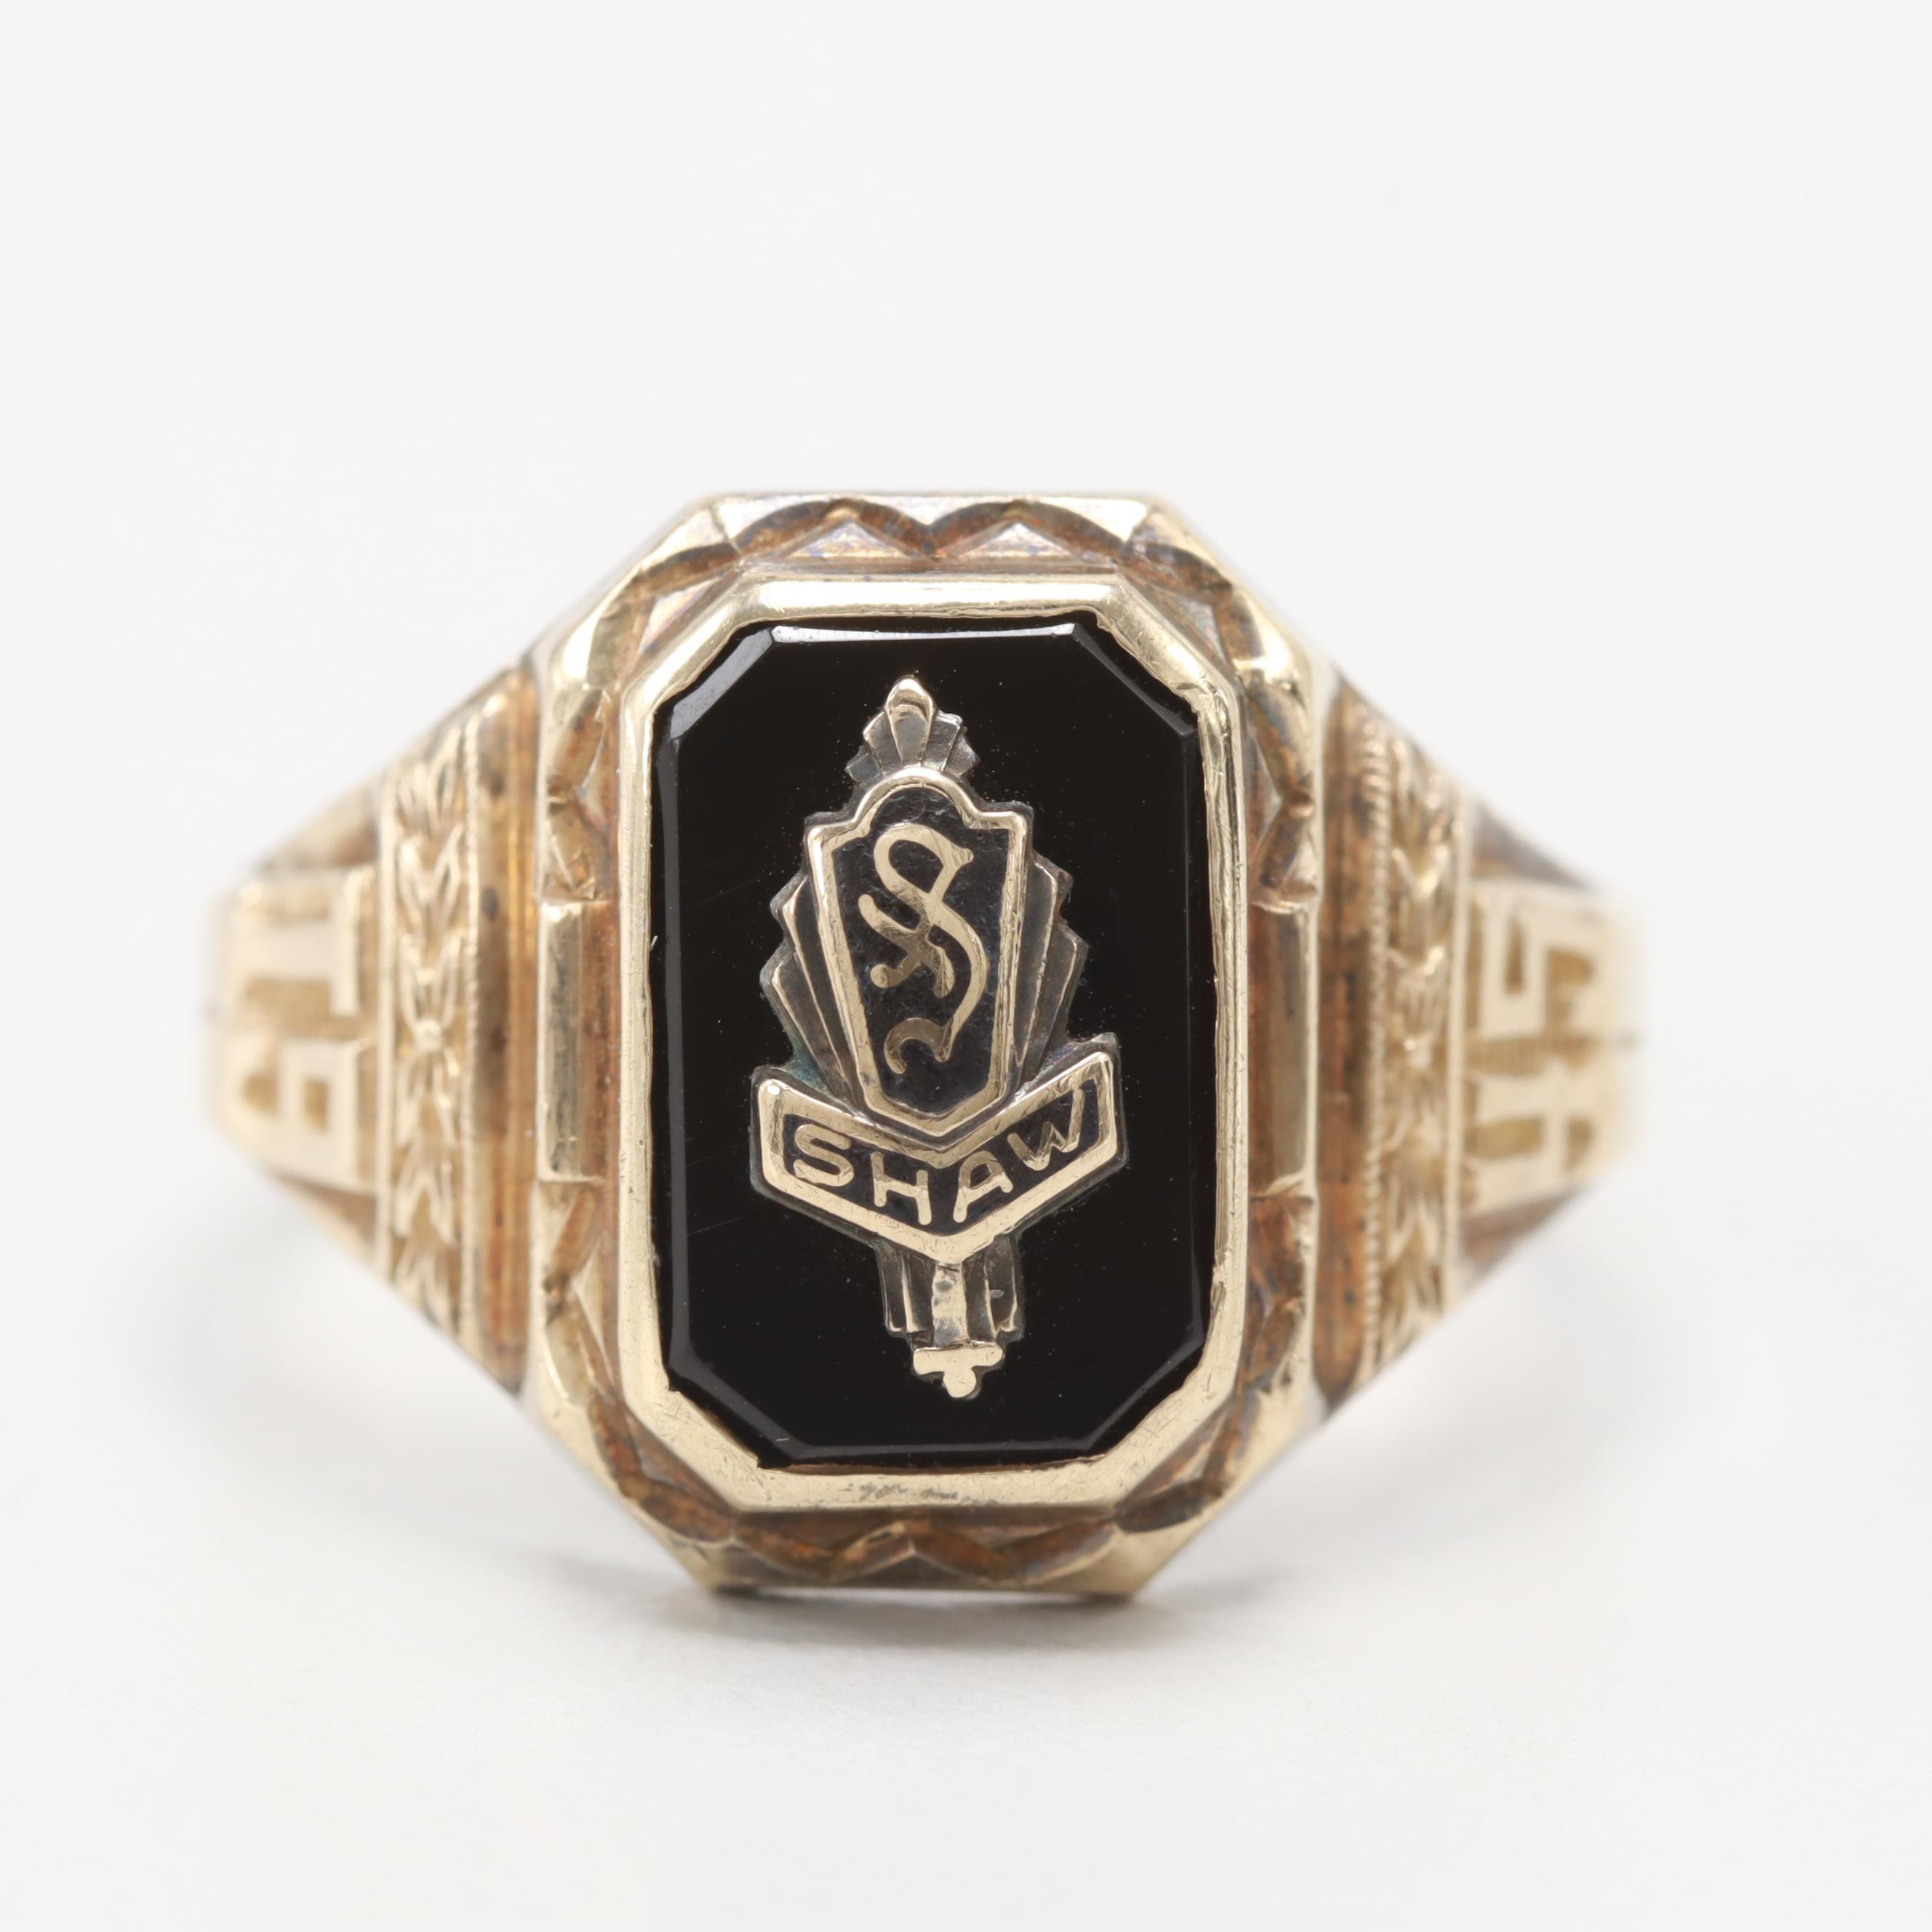 10K Yellow Gold Black and Enamel Onyx Ring